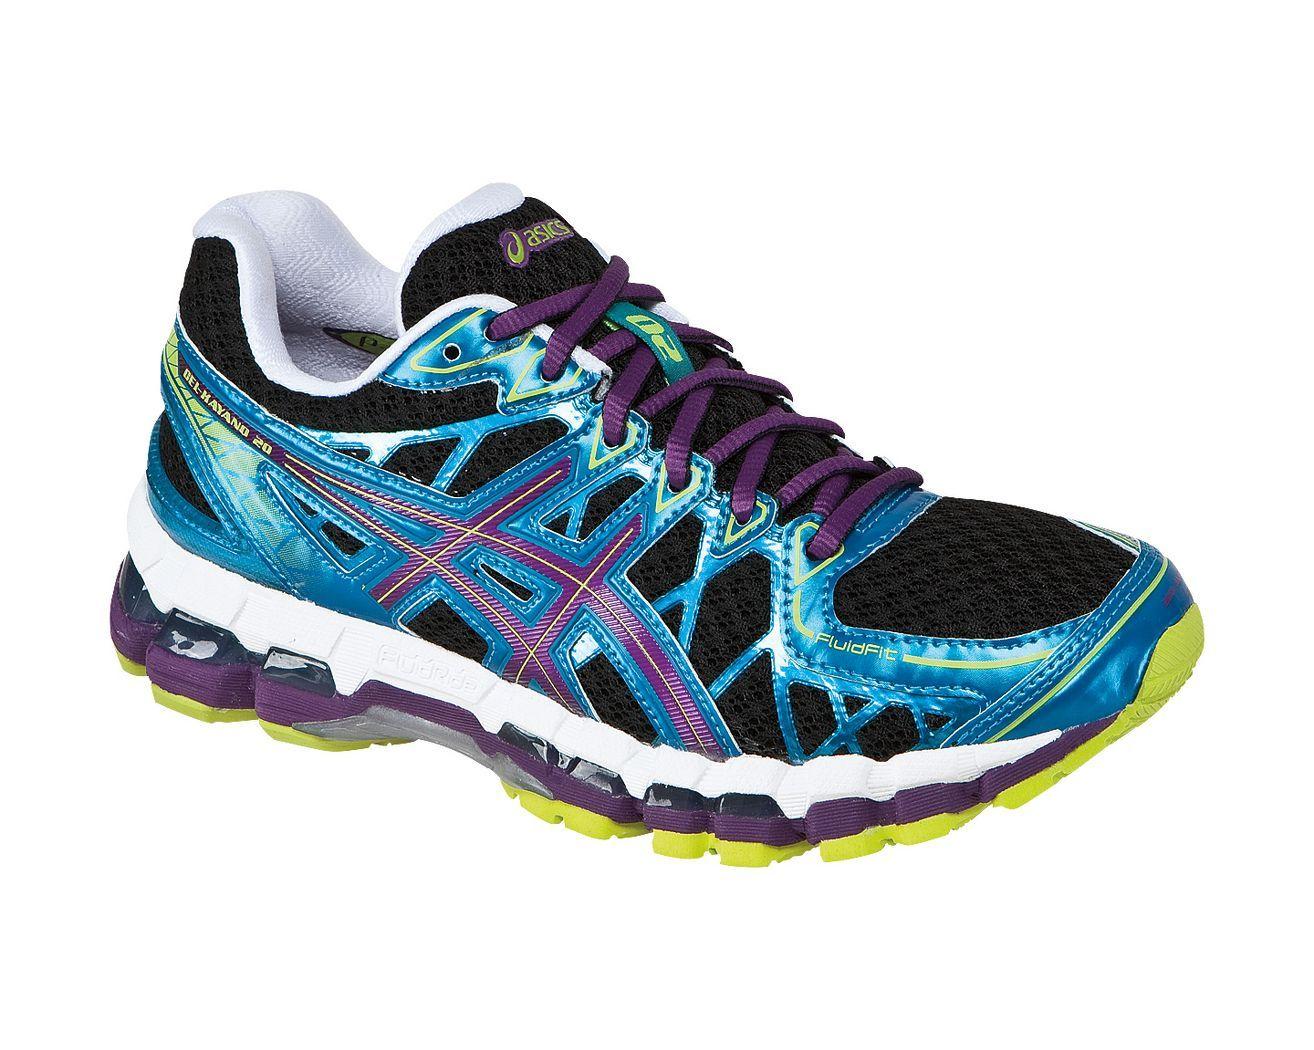 The Running Shoe Review :: Asics Gel Kayano 20